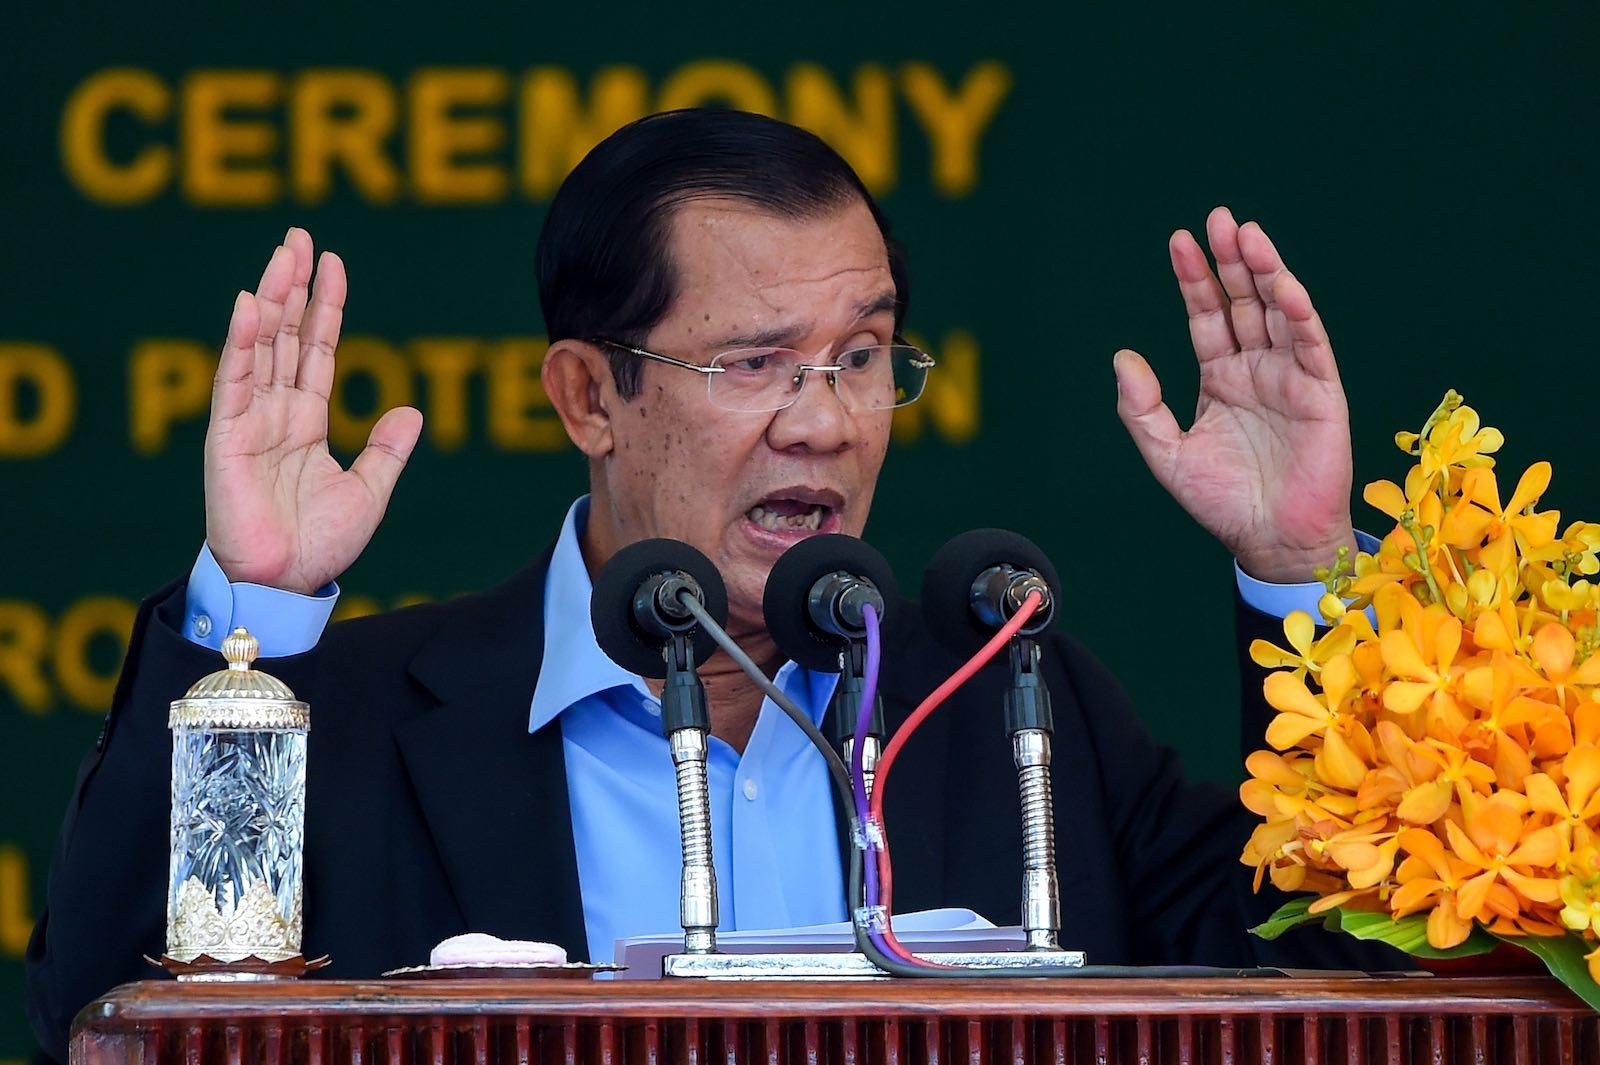 Cambodian Prime Minister Hun Sen (Photo: Tang Chhin Sothy via Getty)